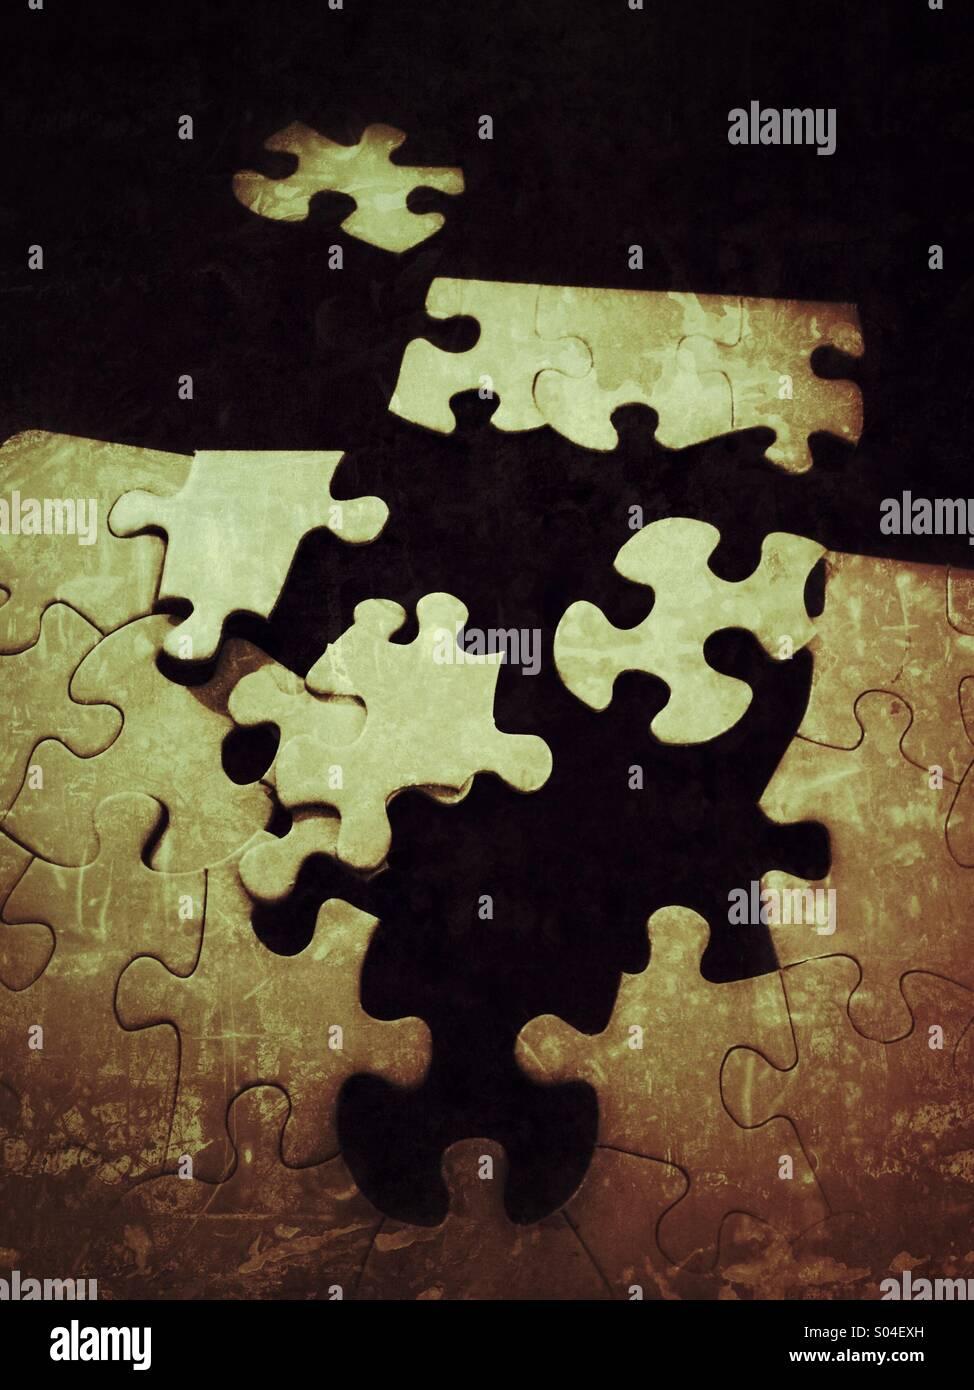 Unfertige puzzle Stockbild